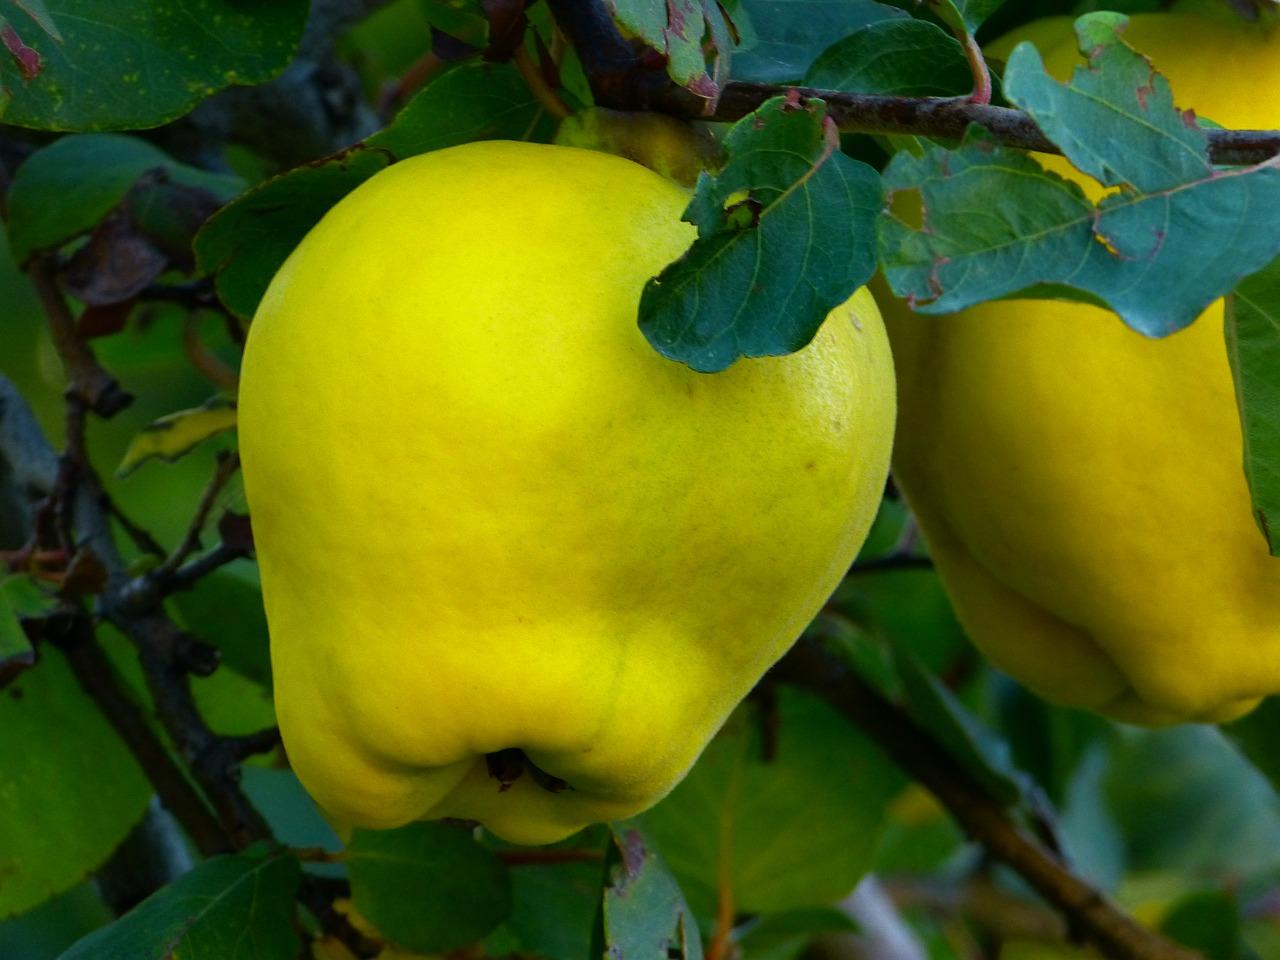 Saisonale Ernährung ist auch bei Lipödem empfohlen